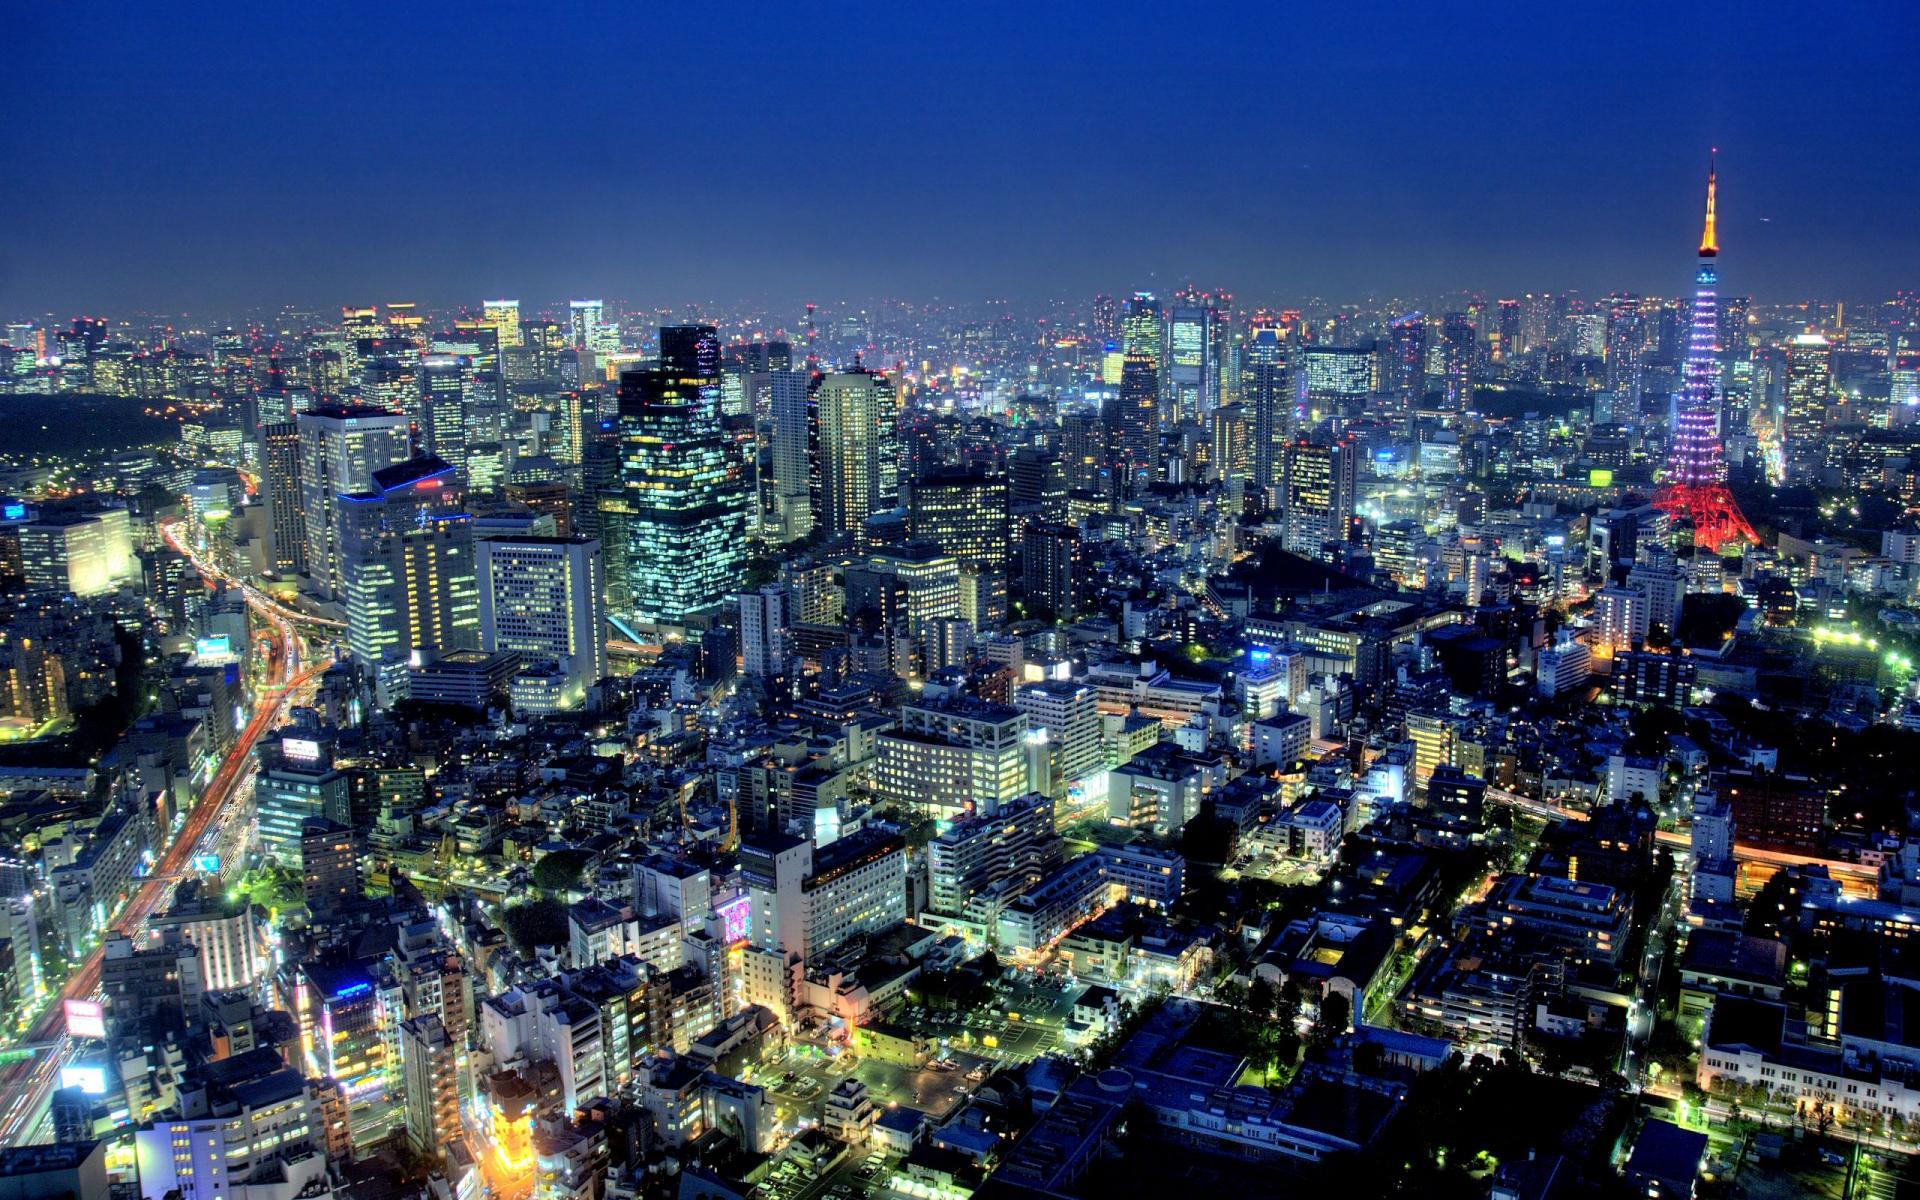 фото города токио япония